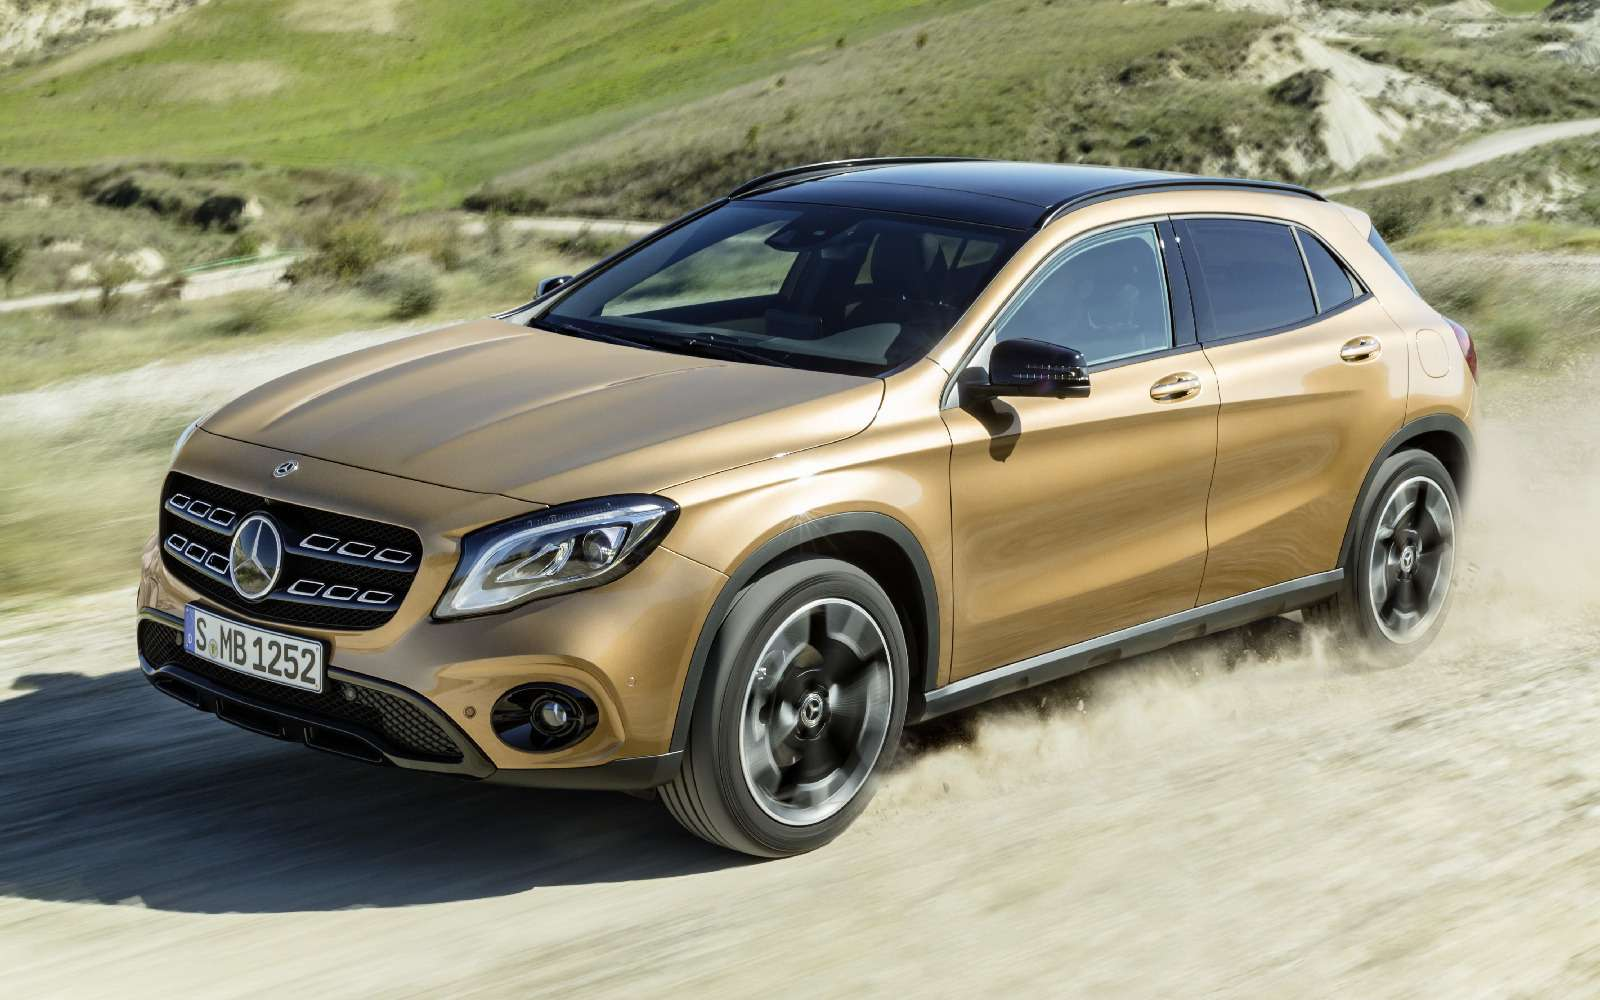 Mercedes-Benz GLA стал краше, ноне просторнее— фото 690068